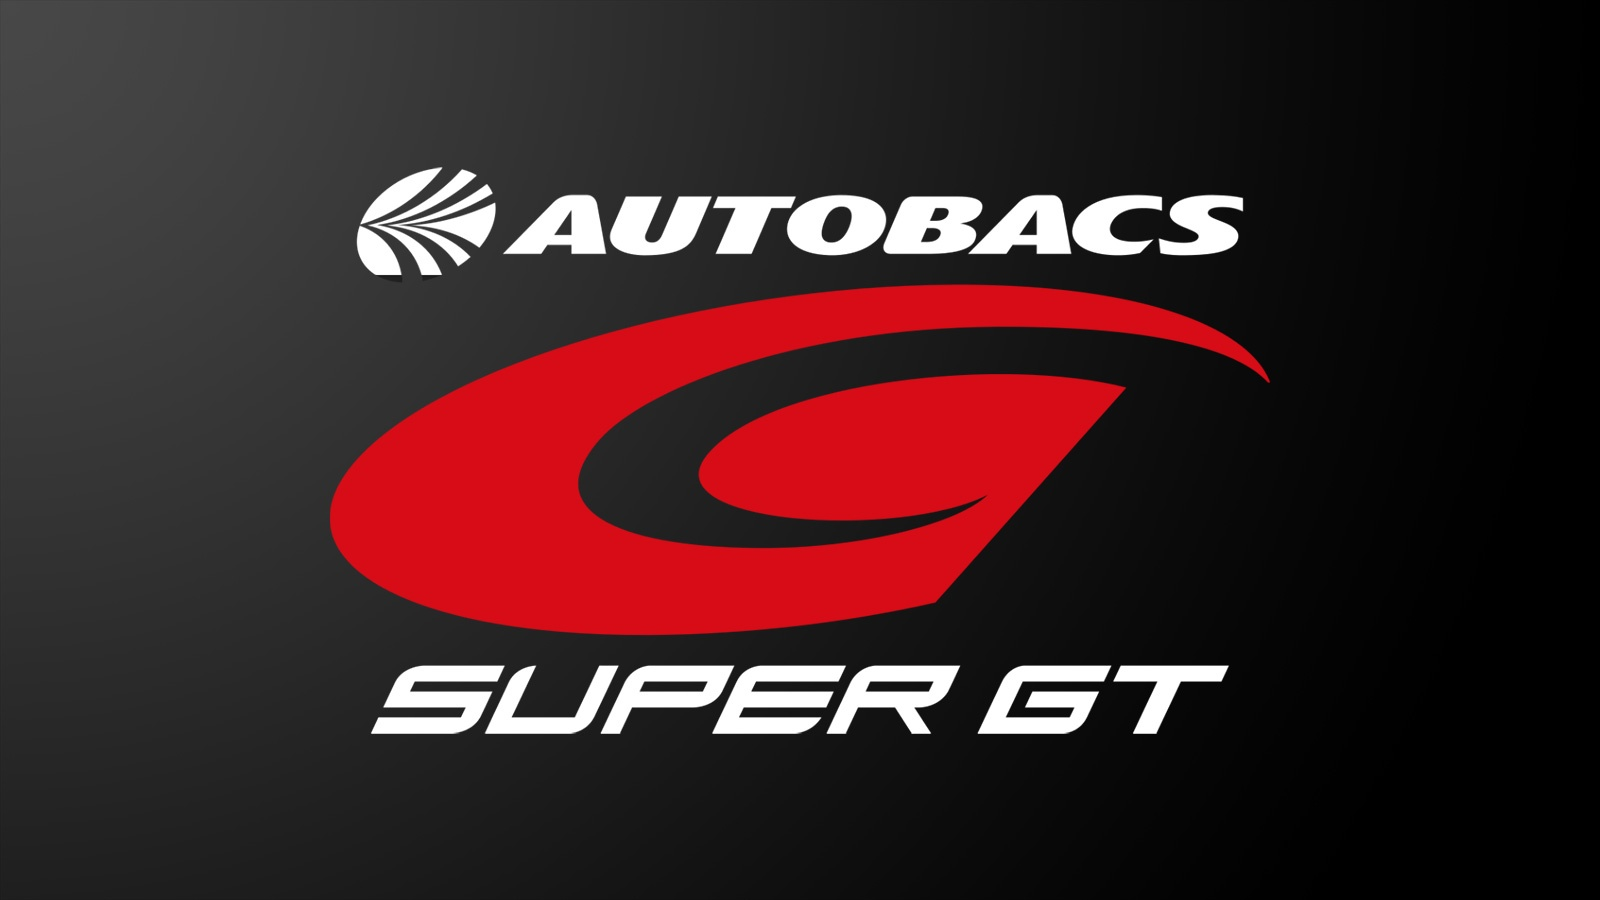 Autobacs-Super-GT-Series-Logo-md.jpg